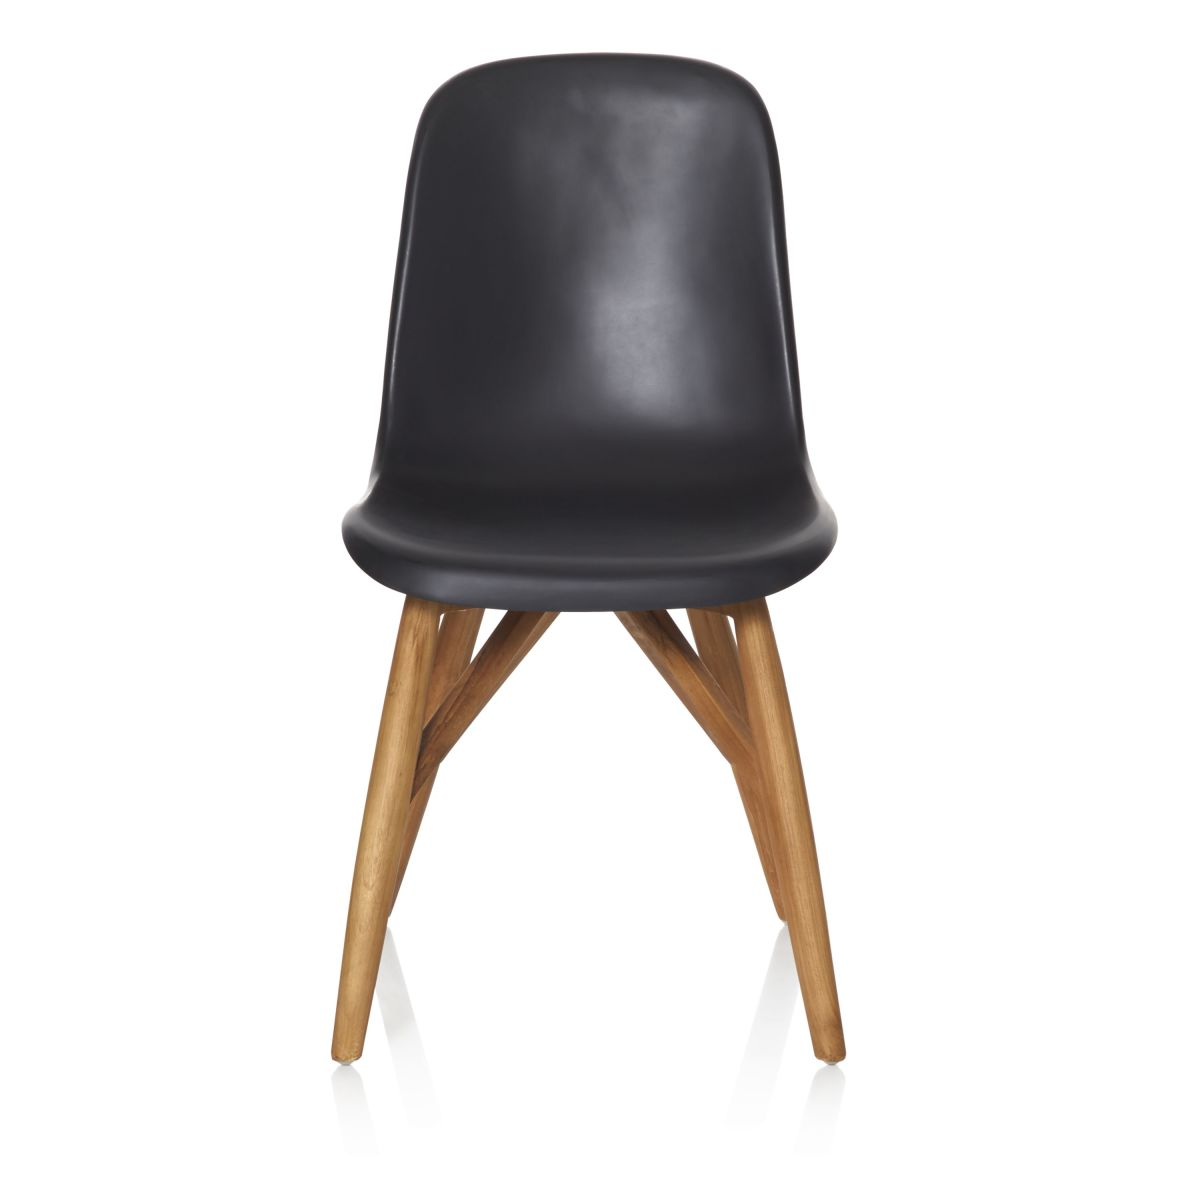 gartenst hle online kaufen m bel suchmaschine. Black Bedroom Furniture Sets. Home Design Ideas